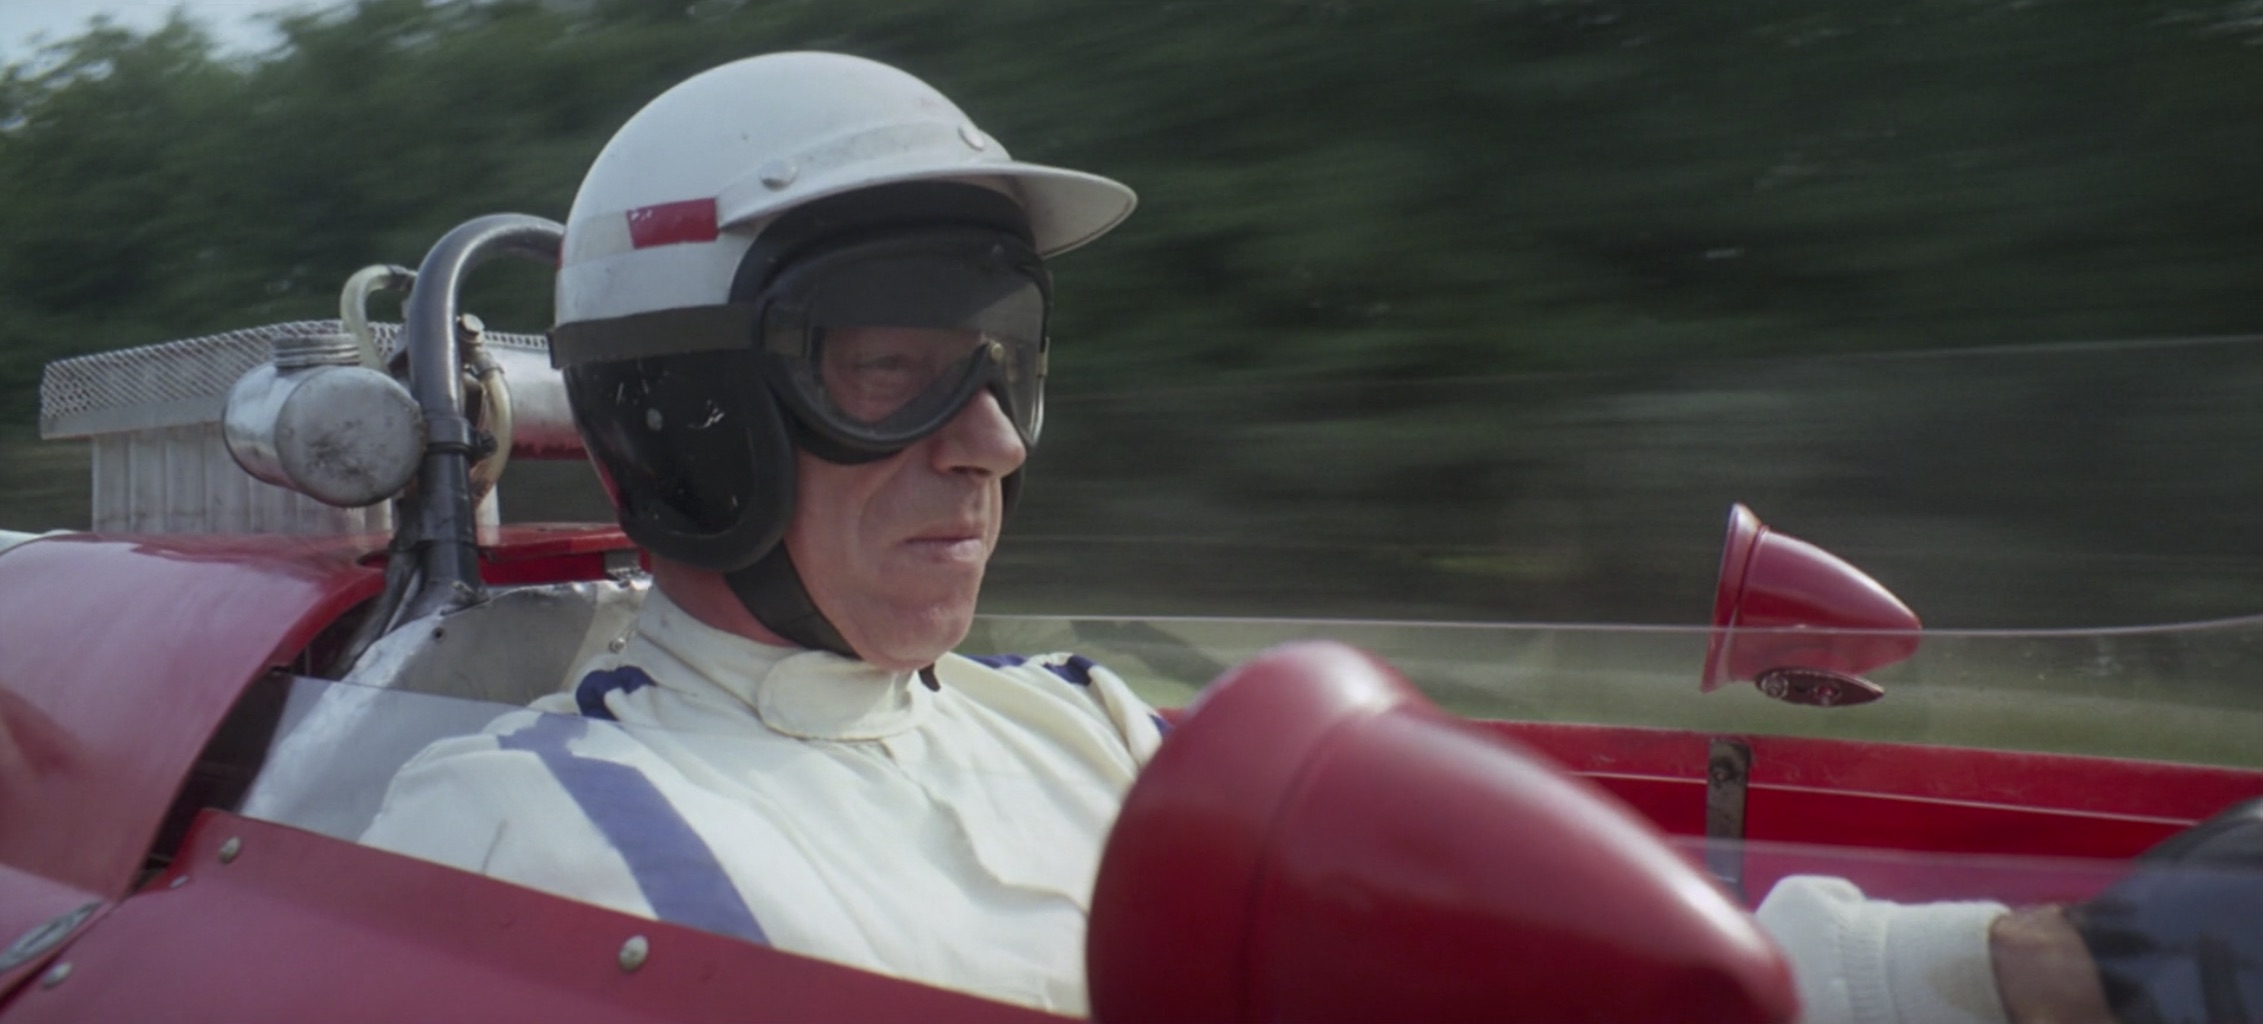 Grand Prix Ferrari Racer cockpit view